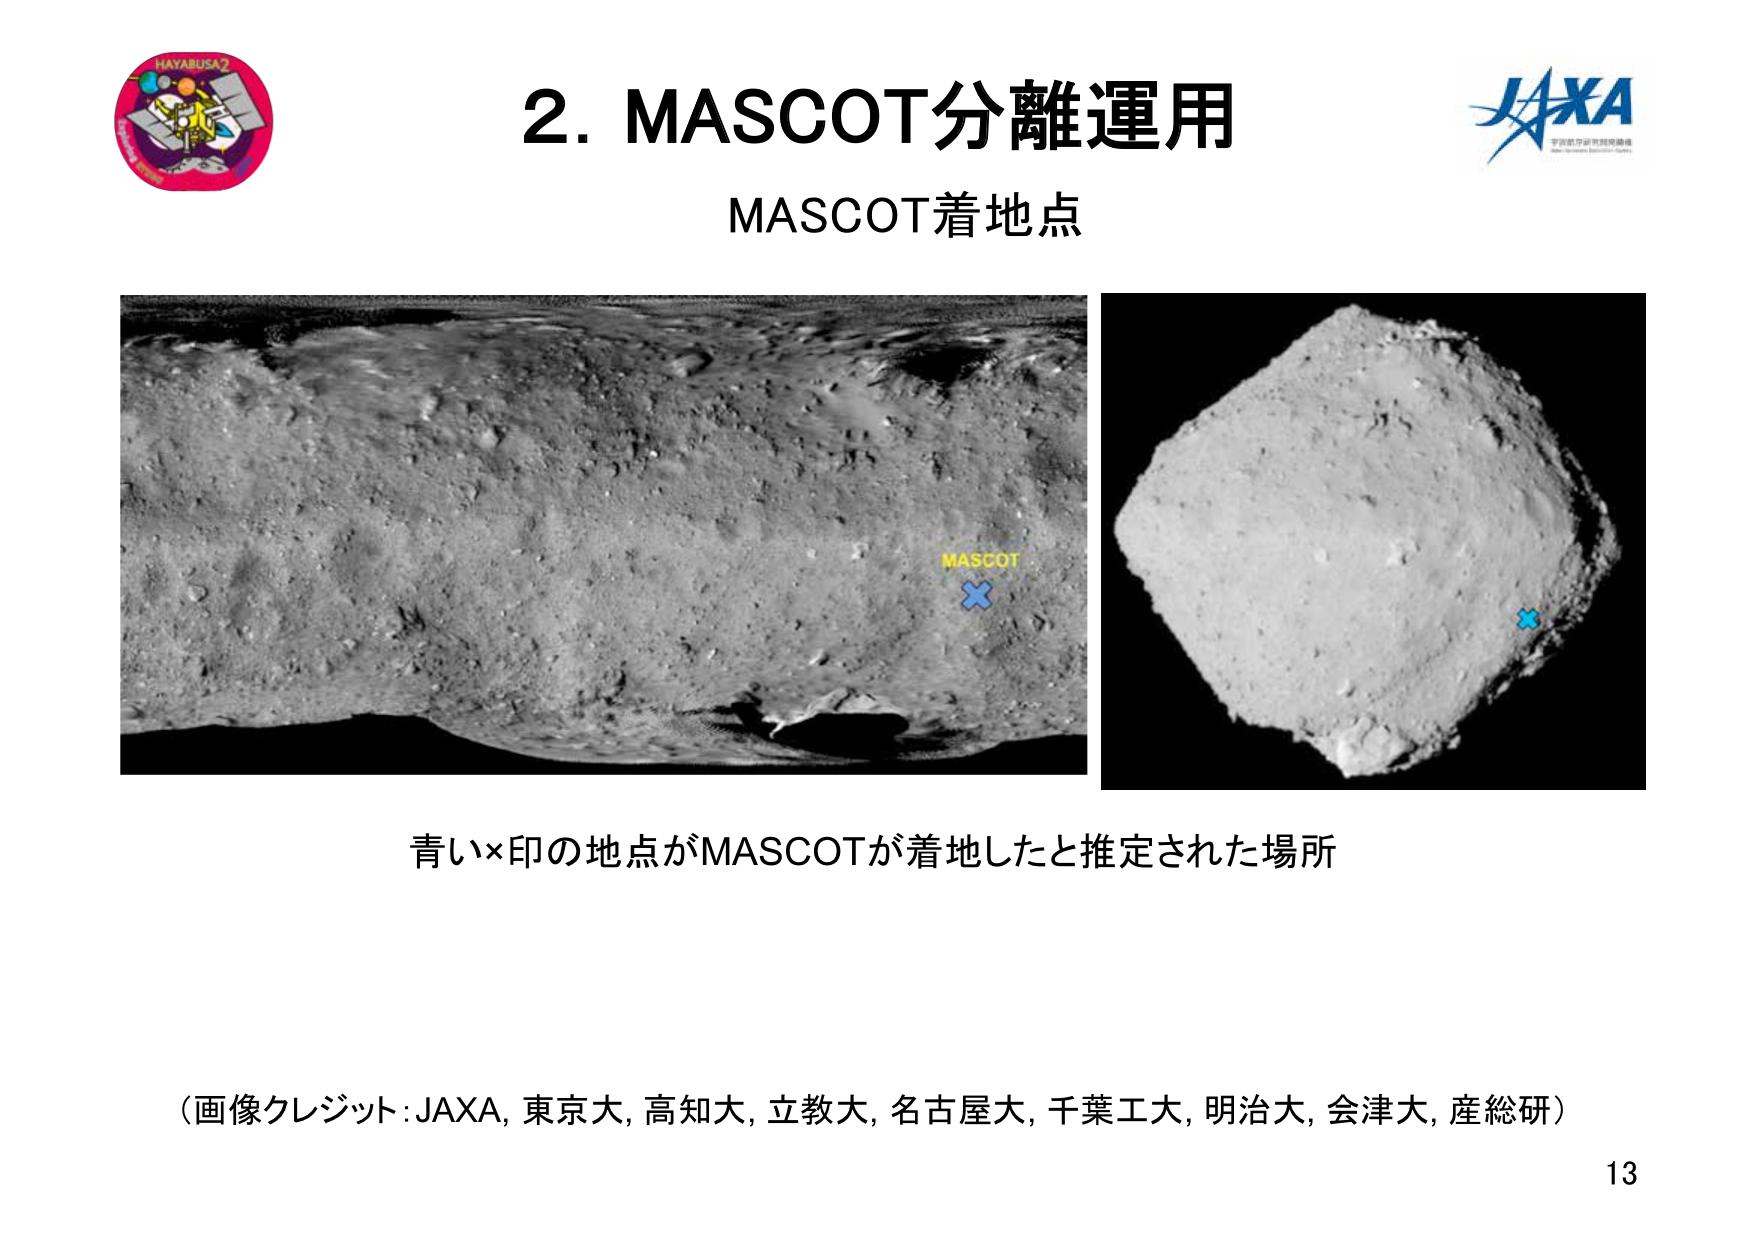 f:id:Imamura:20181011153952p:plain